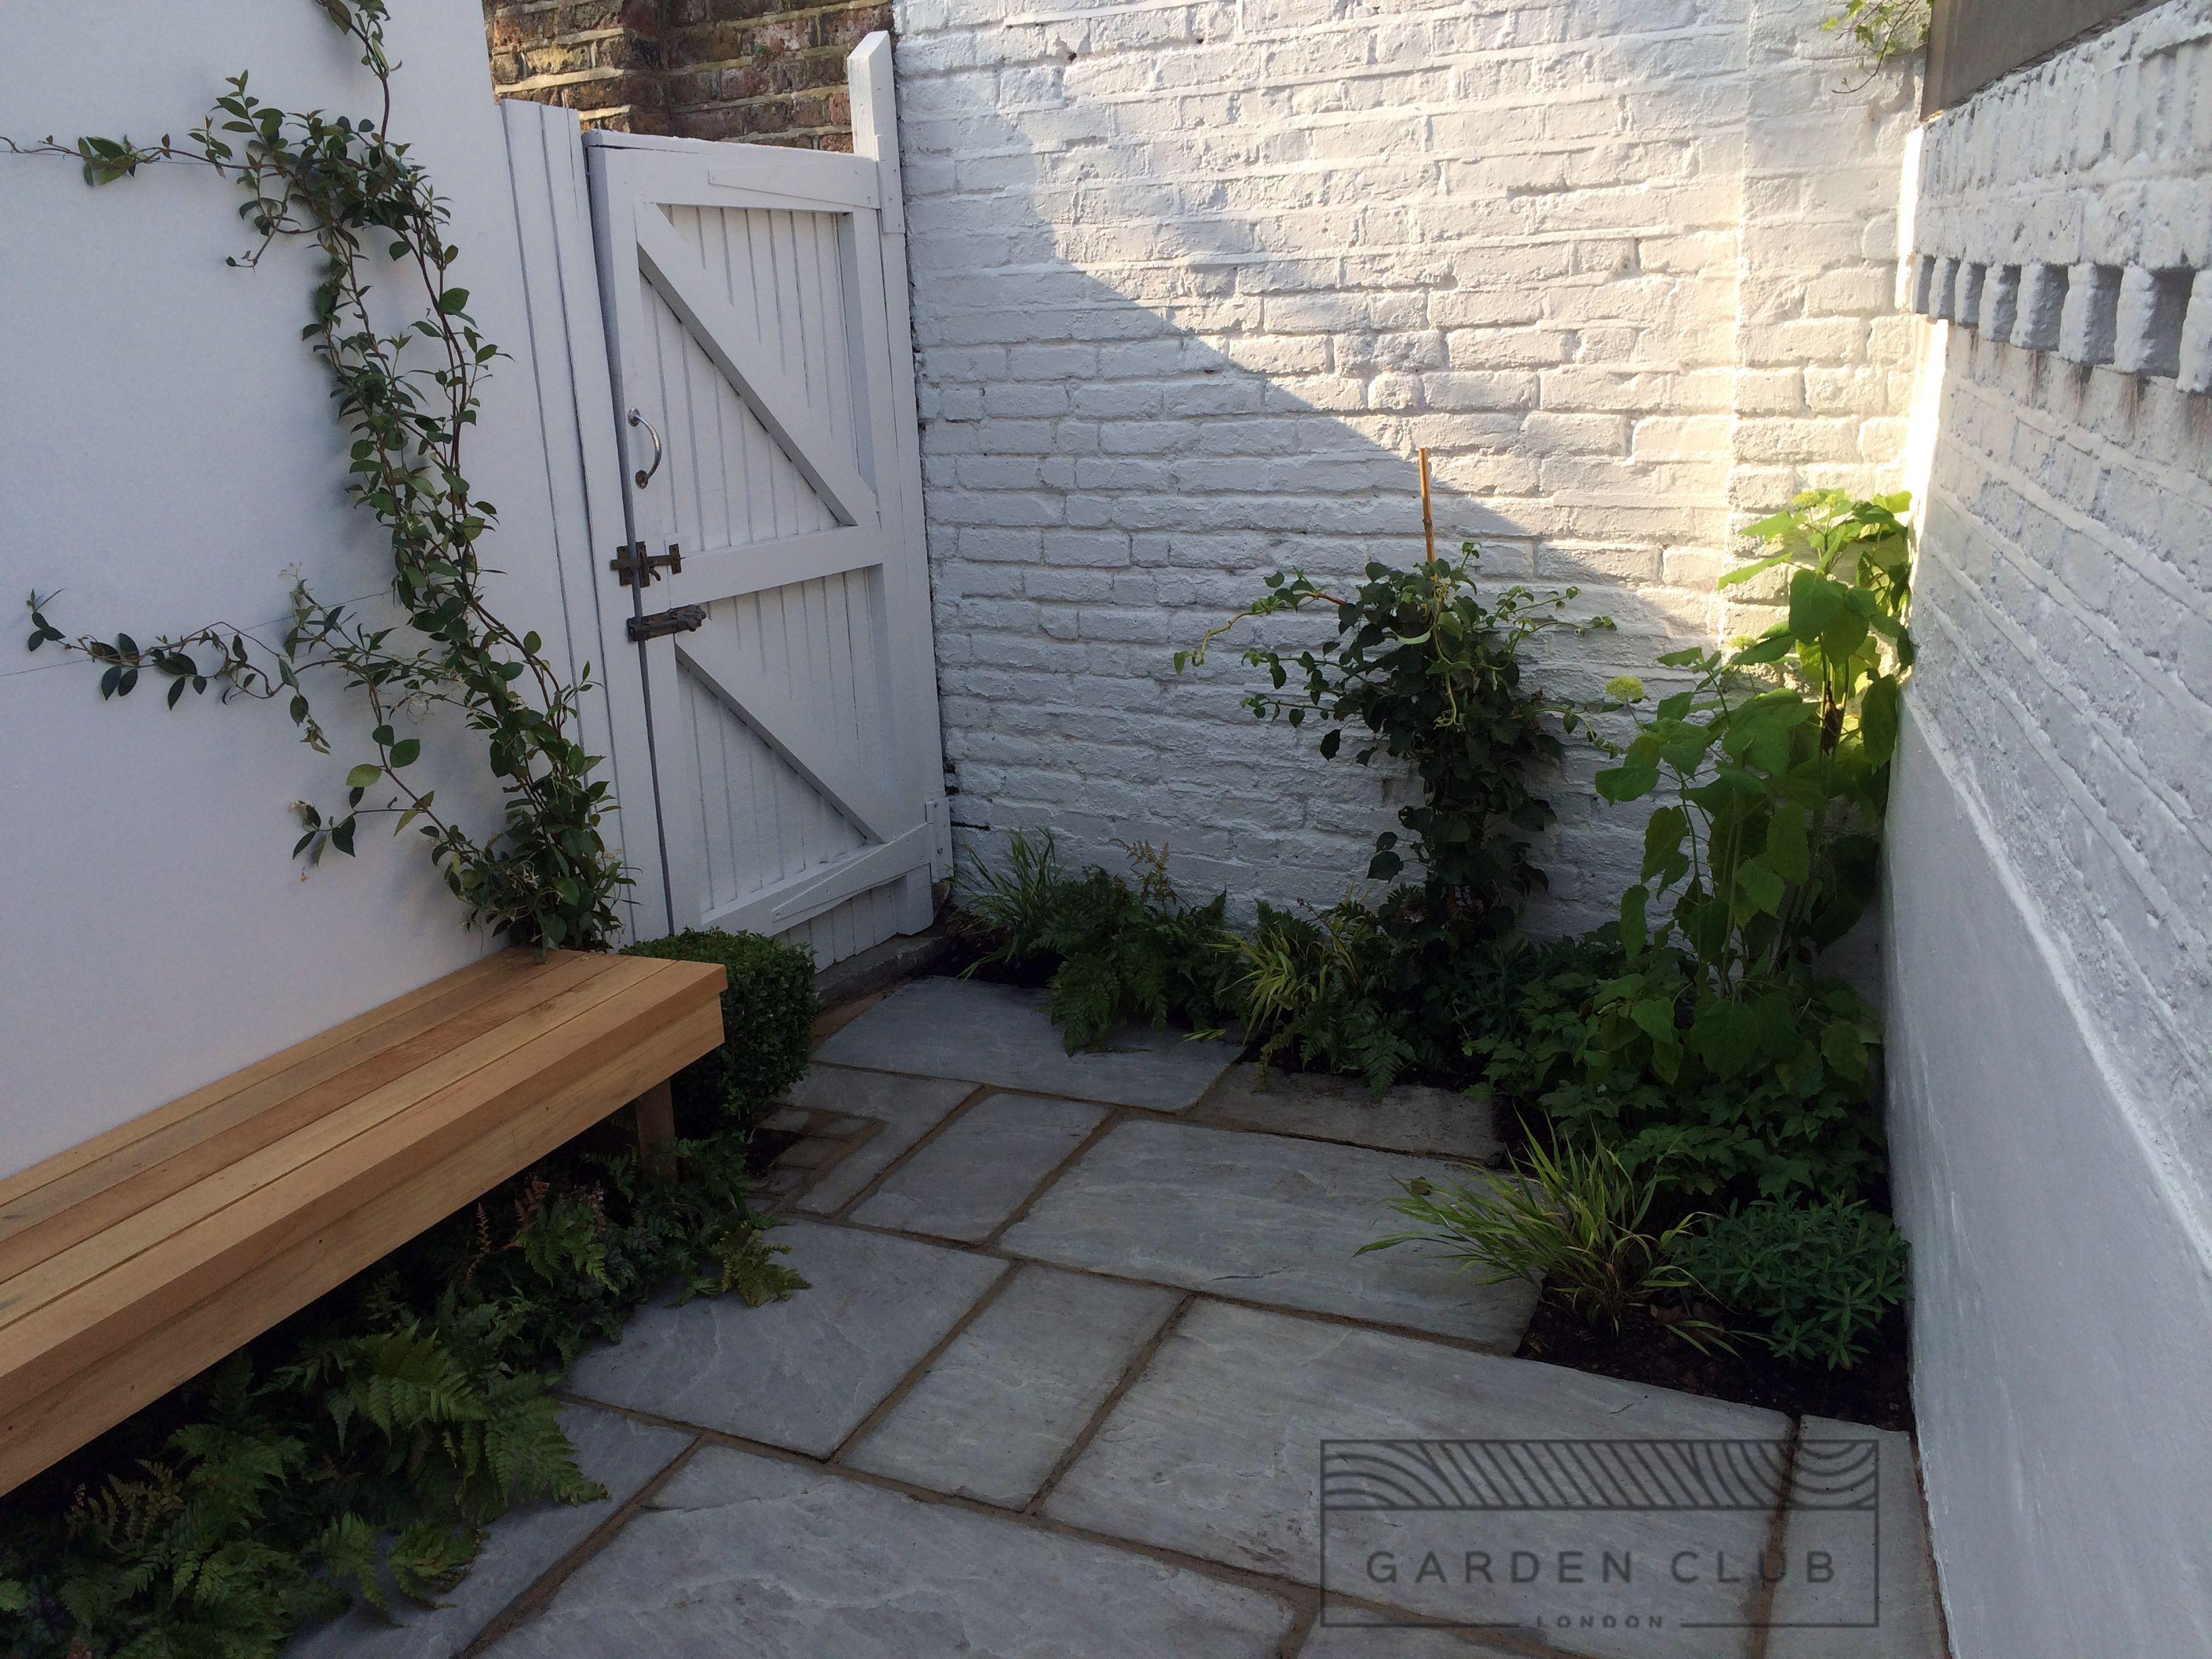 Very Small Back Garden Ideas Google Search Backyard Ideas For Small Yards Small Courtyard Gardens Small Backyard Landscaping